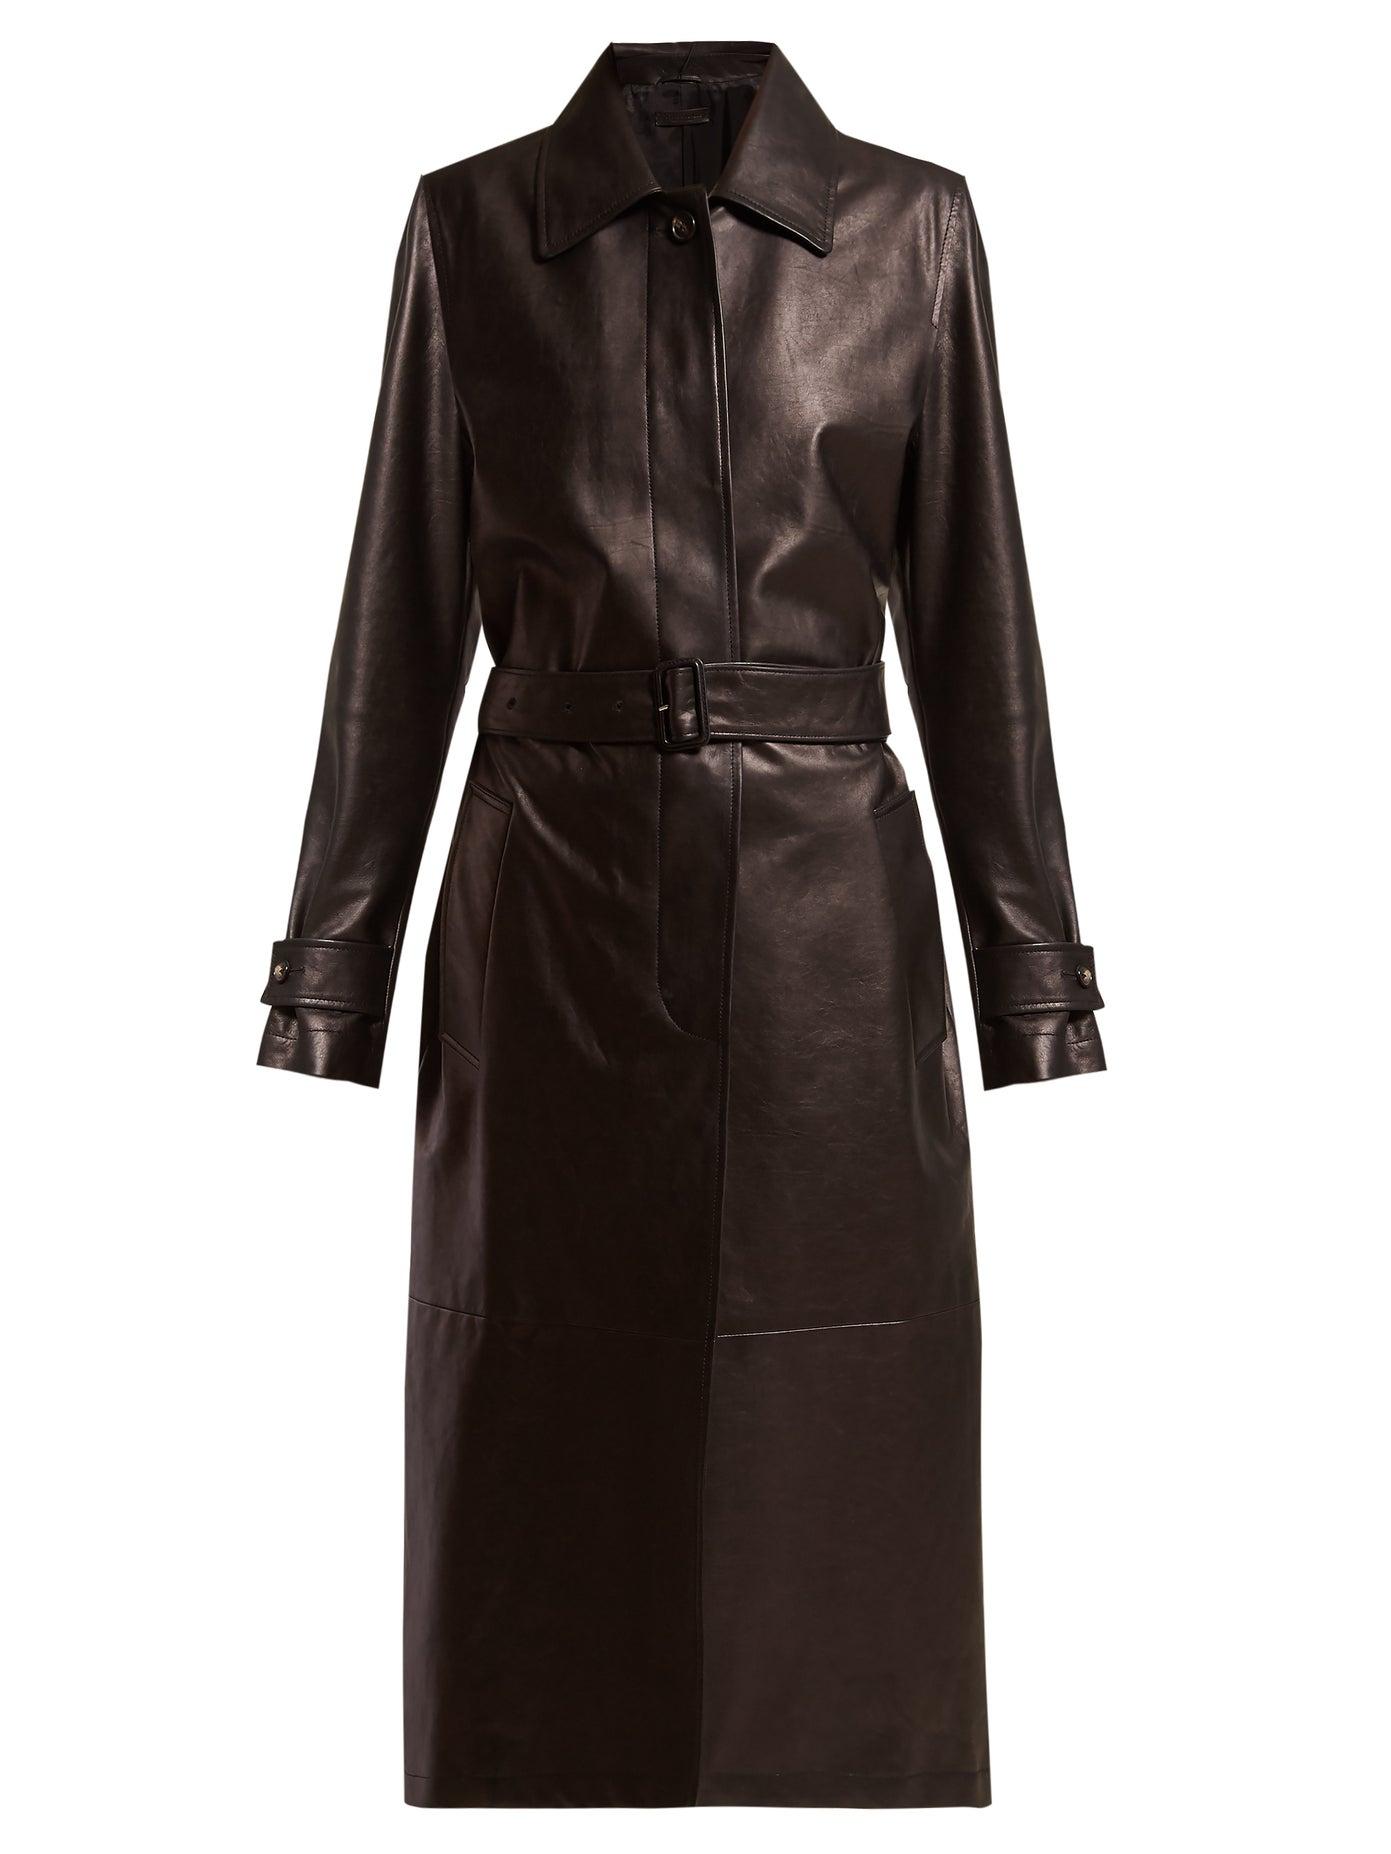 Single Breasted Leather Coat by Bottega Veneta, available on matchesfashion.com for $5168 Hailey Baldwin Outerwear Exact Product